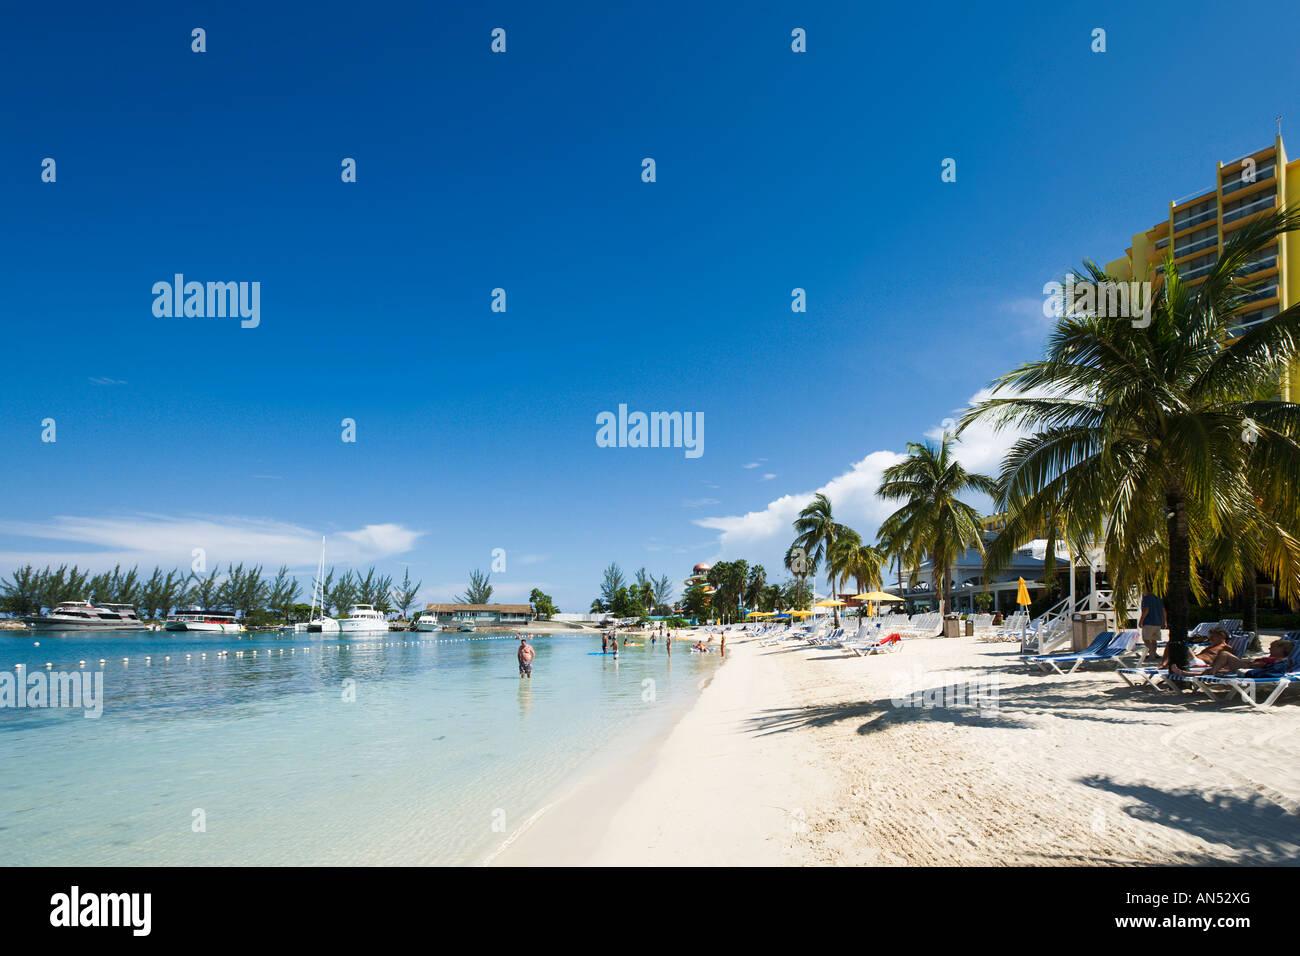 Beach near 'Sunset Jamaica Grande' Hotel, Ocho Rios Bay, Ocho Rios, Jamaica, Caribbean, West Indies - Stock Image